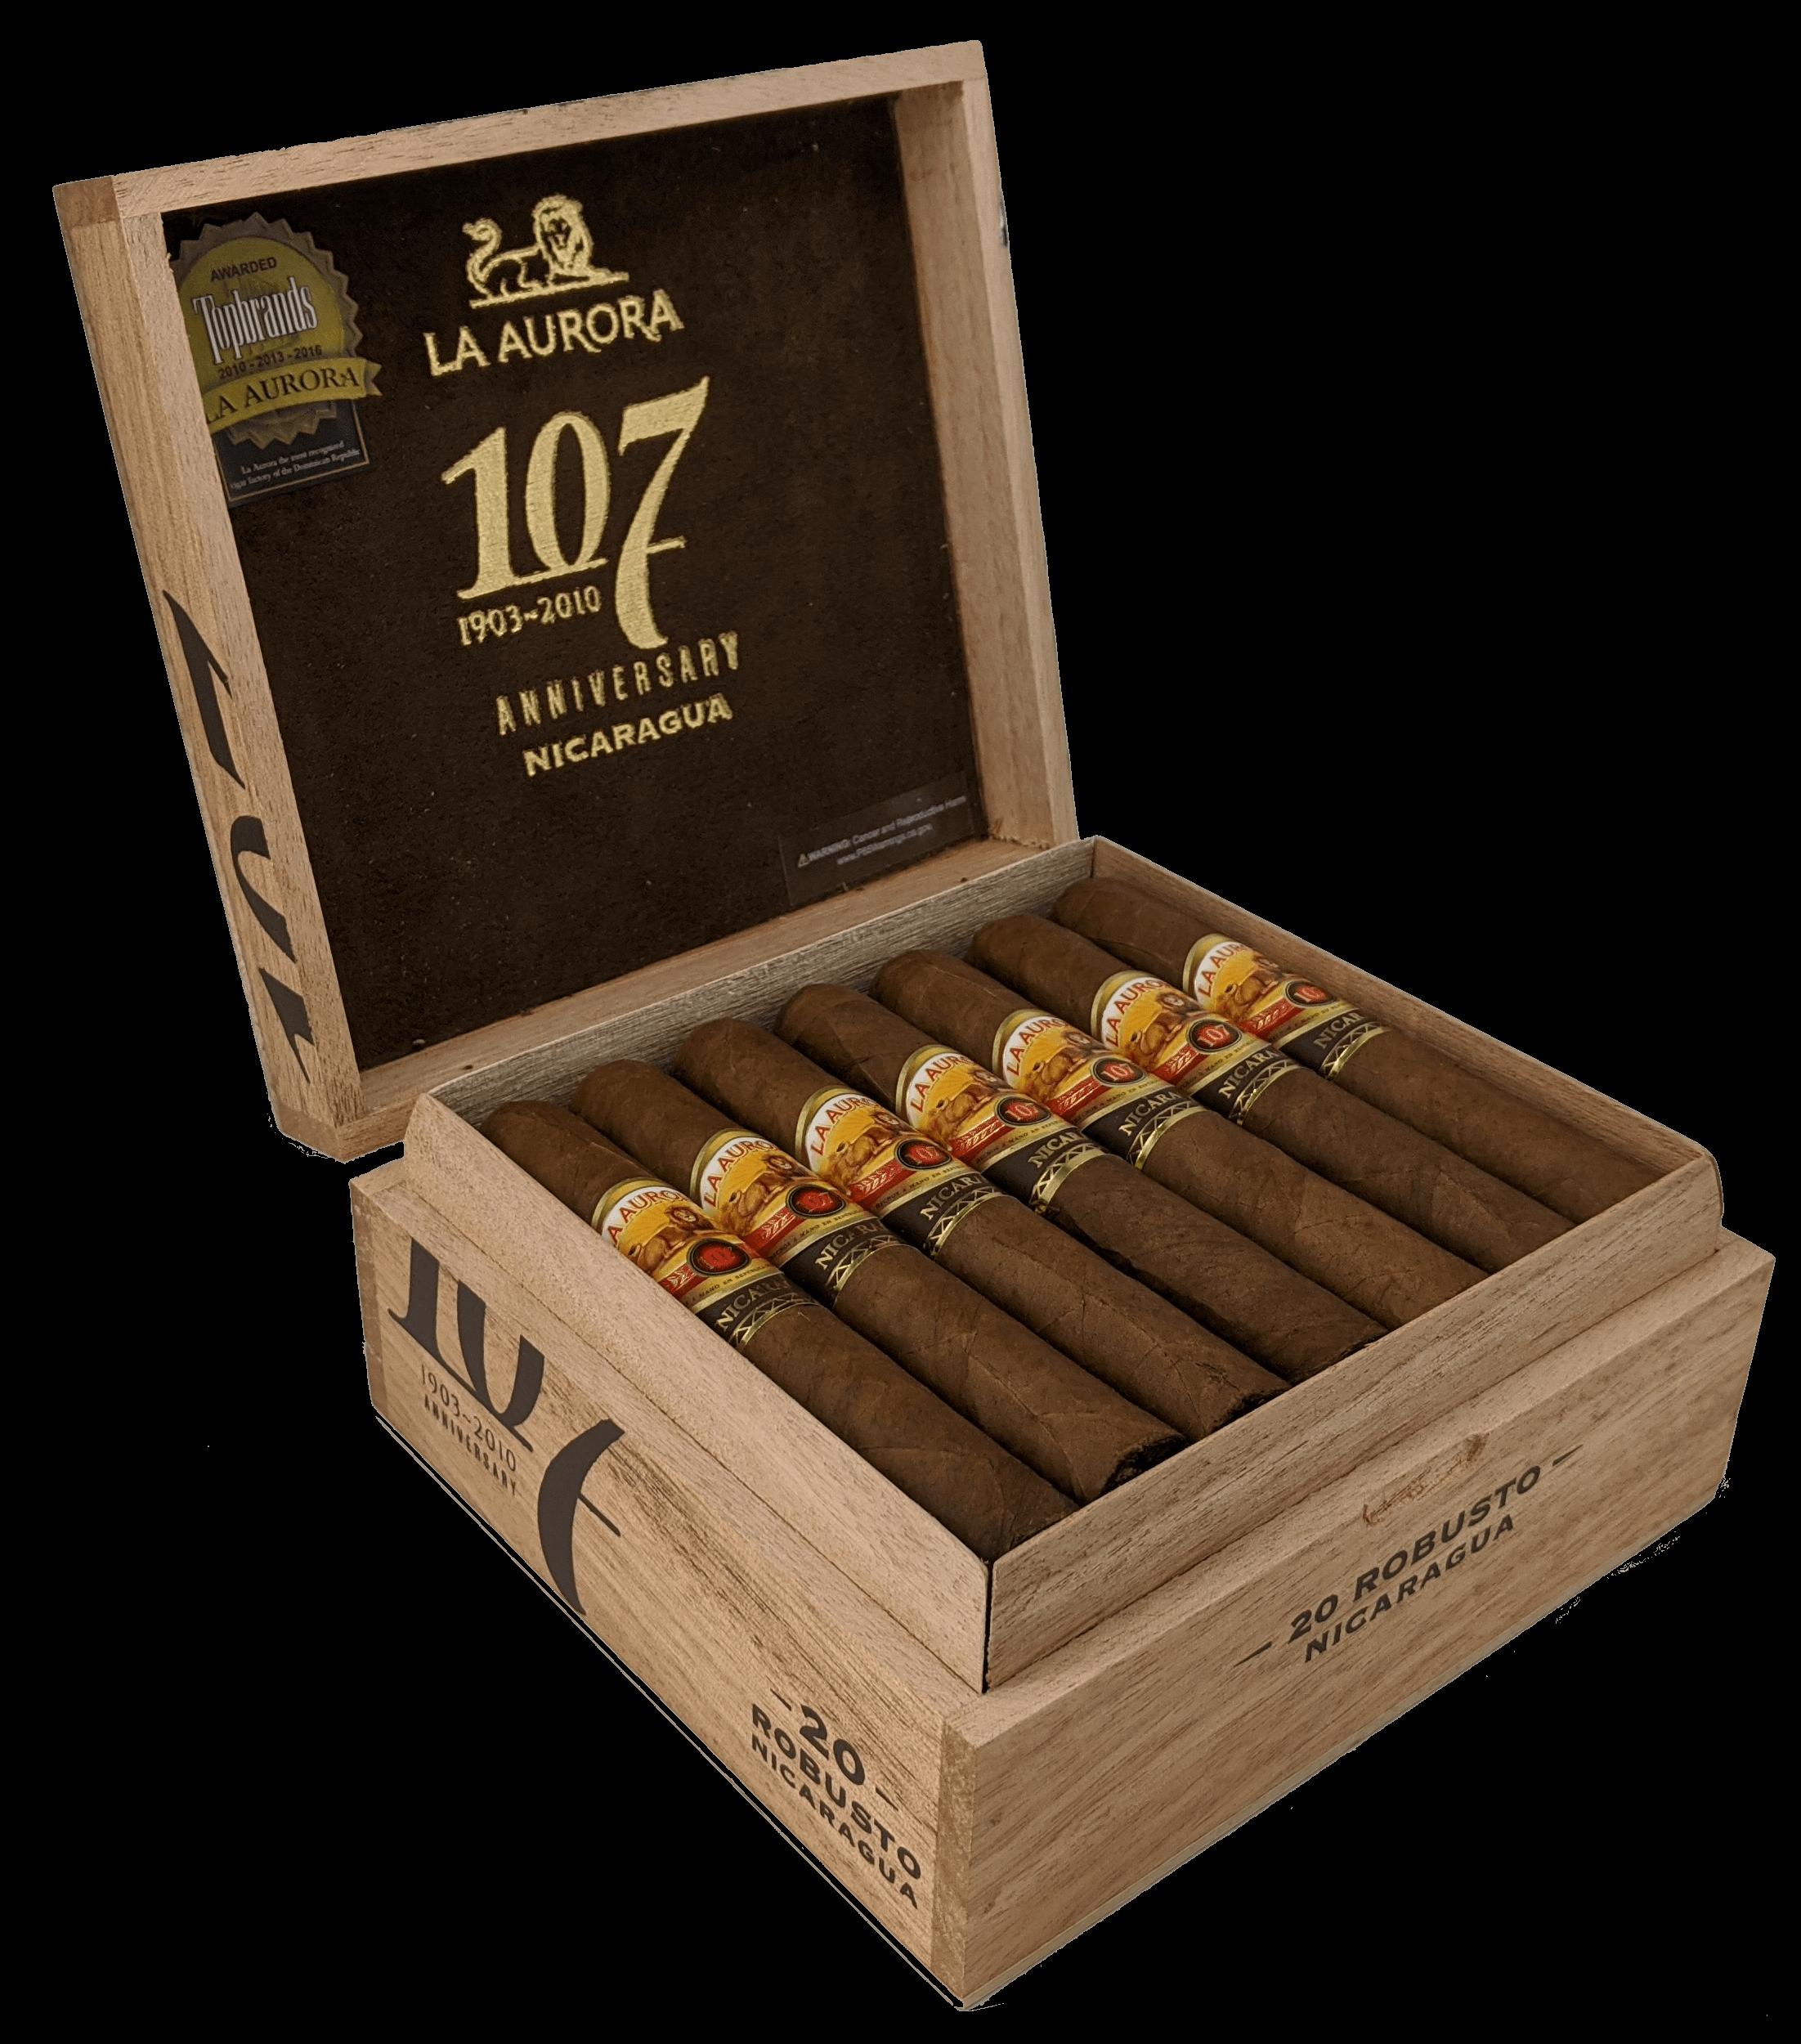 Cigar News: La Aurora Unveils 107 Nicaragua